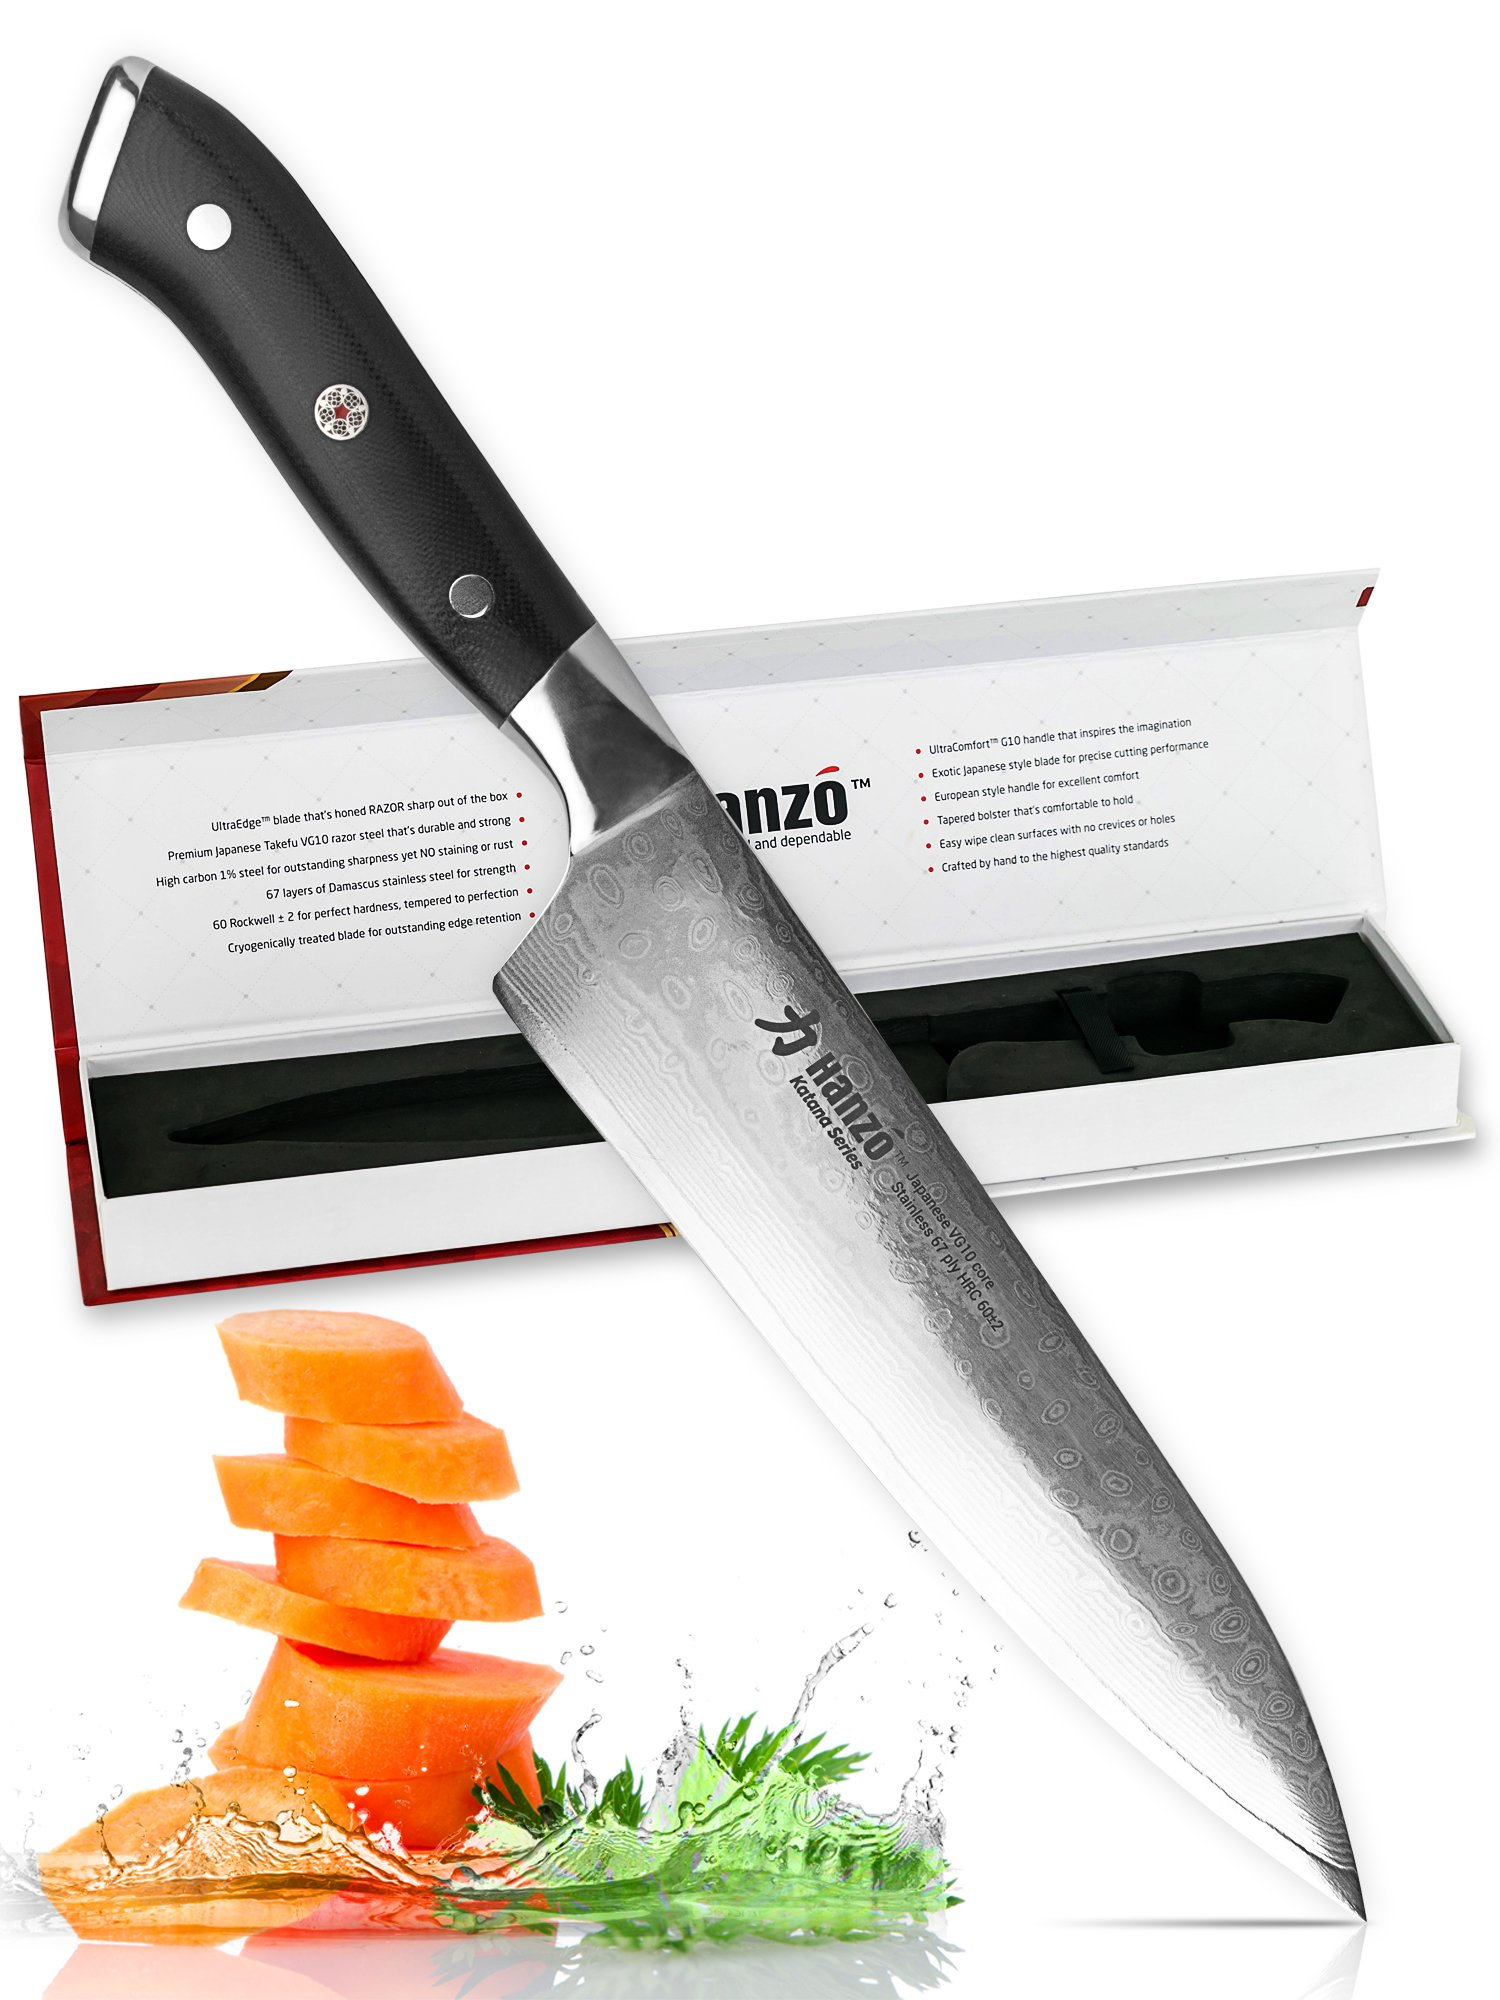 Hanzo Chef Knife Professional Knives - 8 inch Katana Series - Full Length VG-10 Japanese Steel Tang - G10 Military Grade Custom Contoured Handle - Superior Edge Retention and Handling